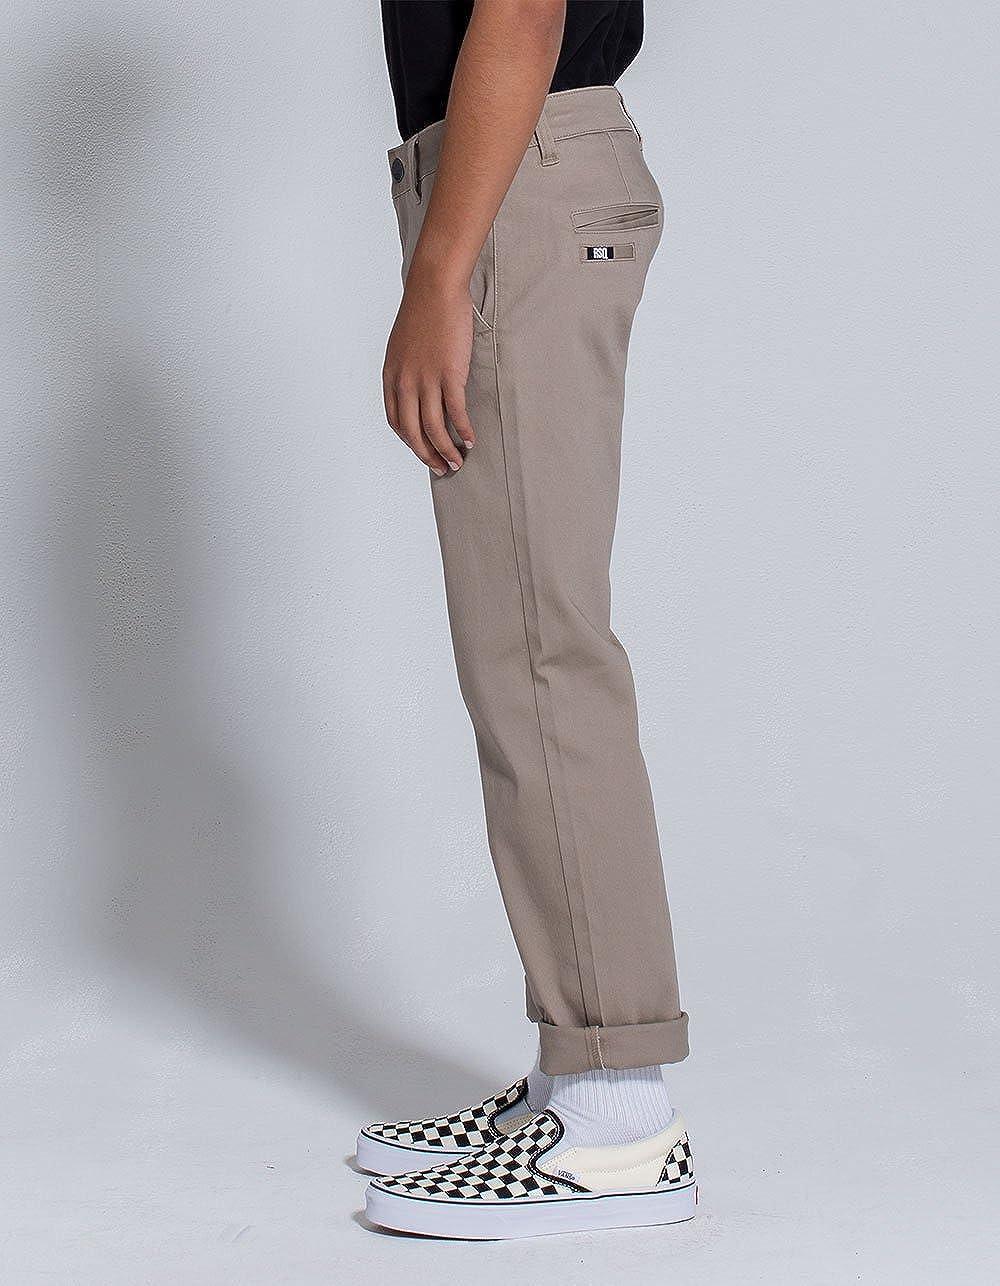 RSQ London Khaki Boys Skinny Stretch Chino Pants Khaki 16